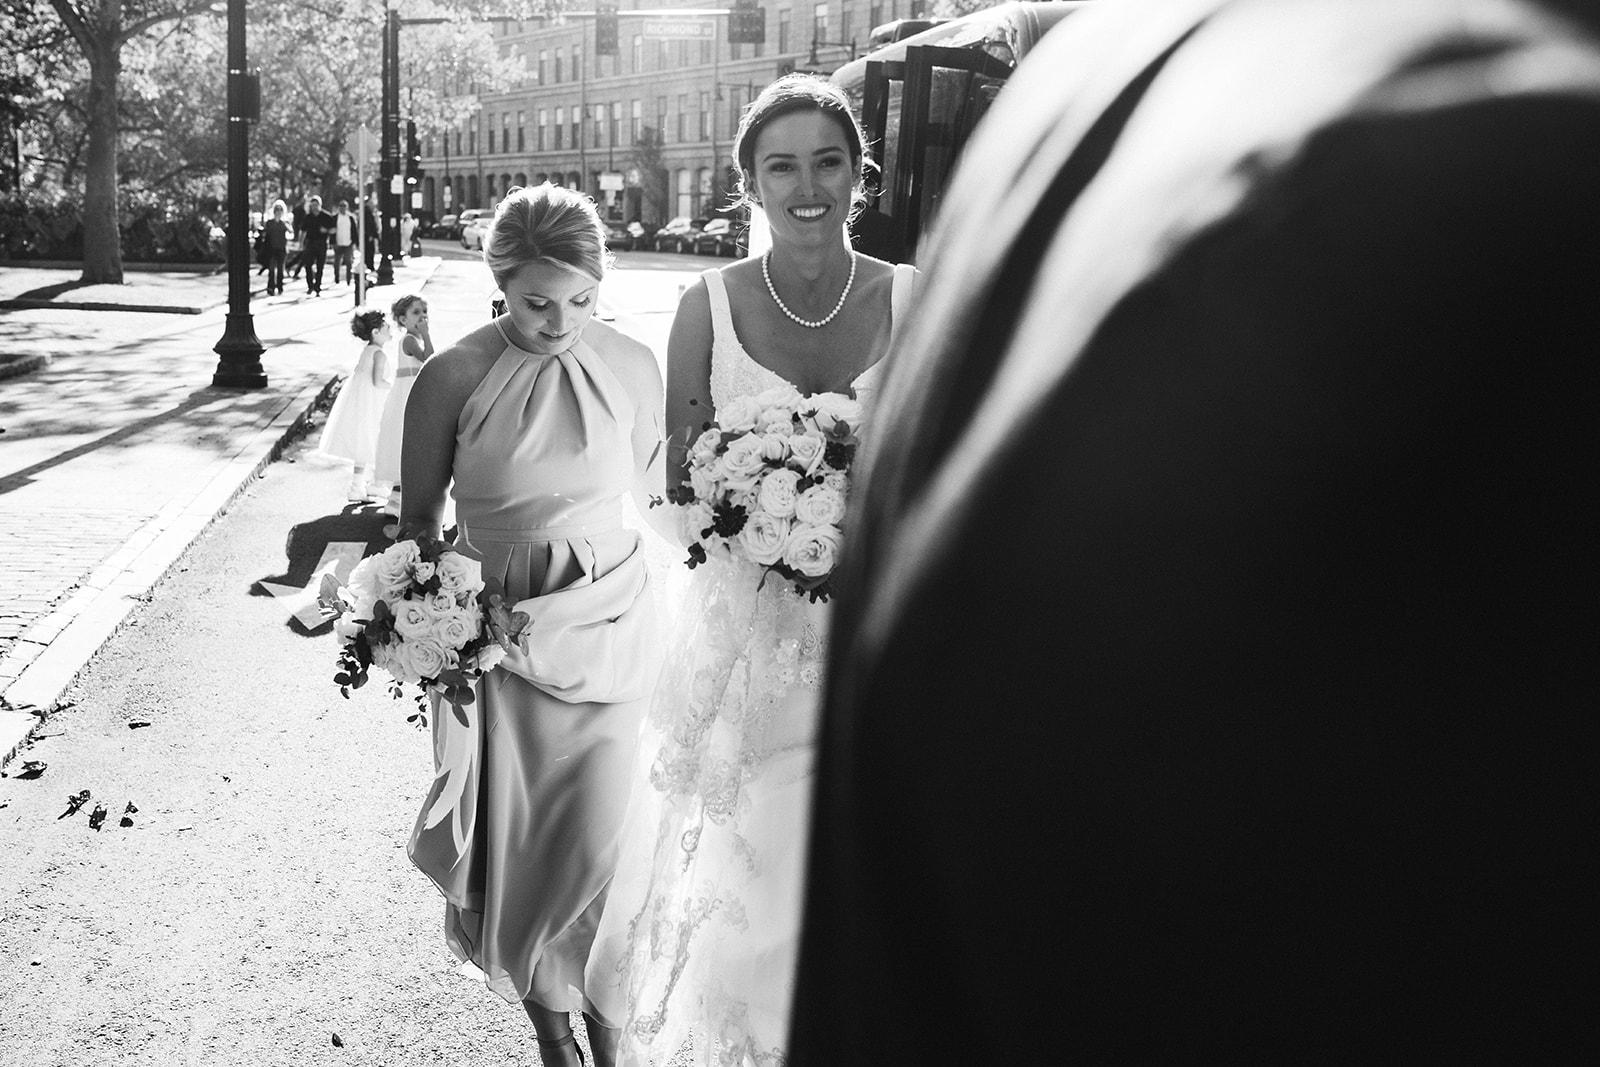 wedding-flowers-state-room-boston-lesfleurs (3).jpg